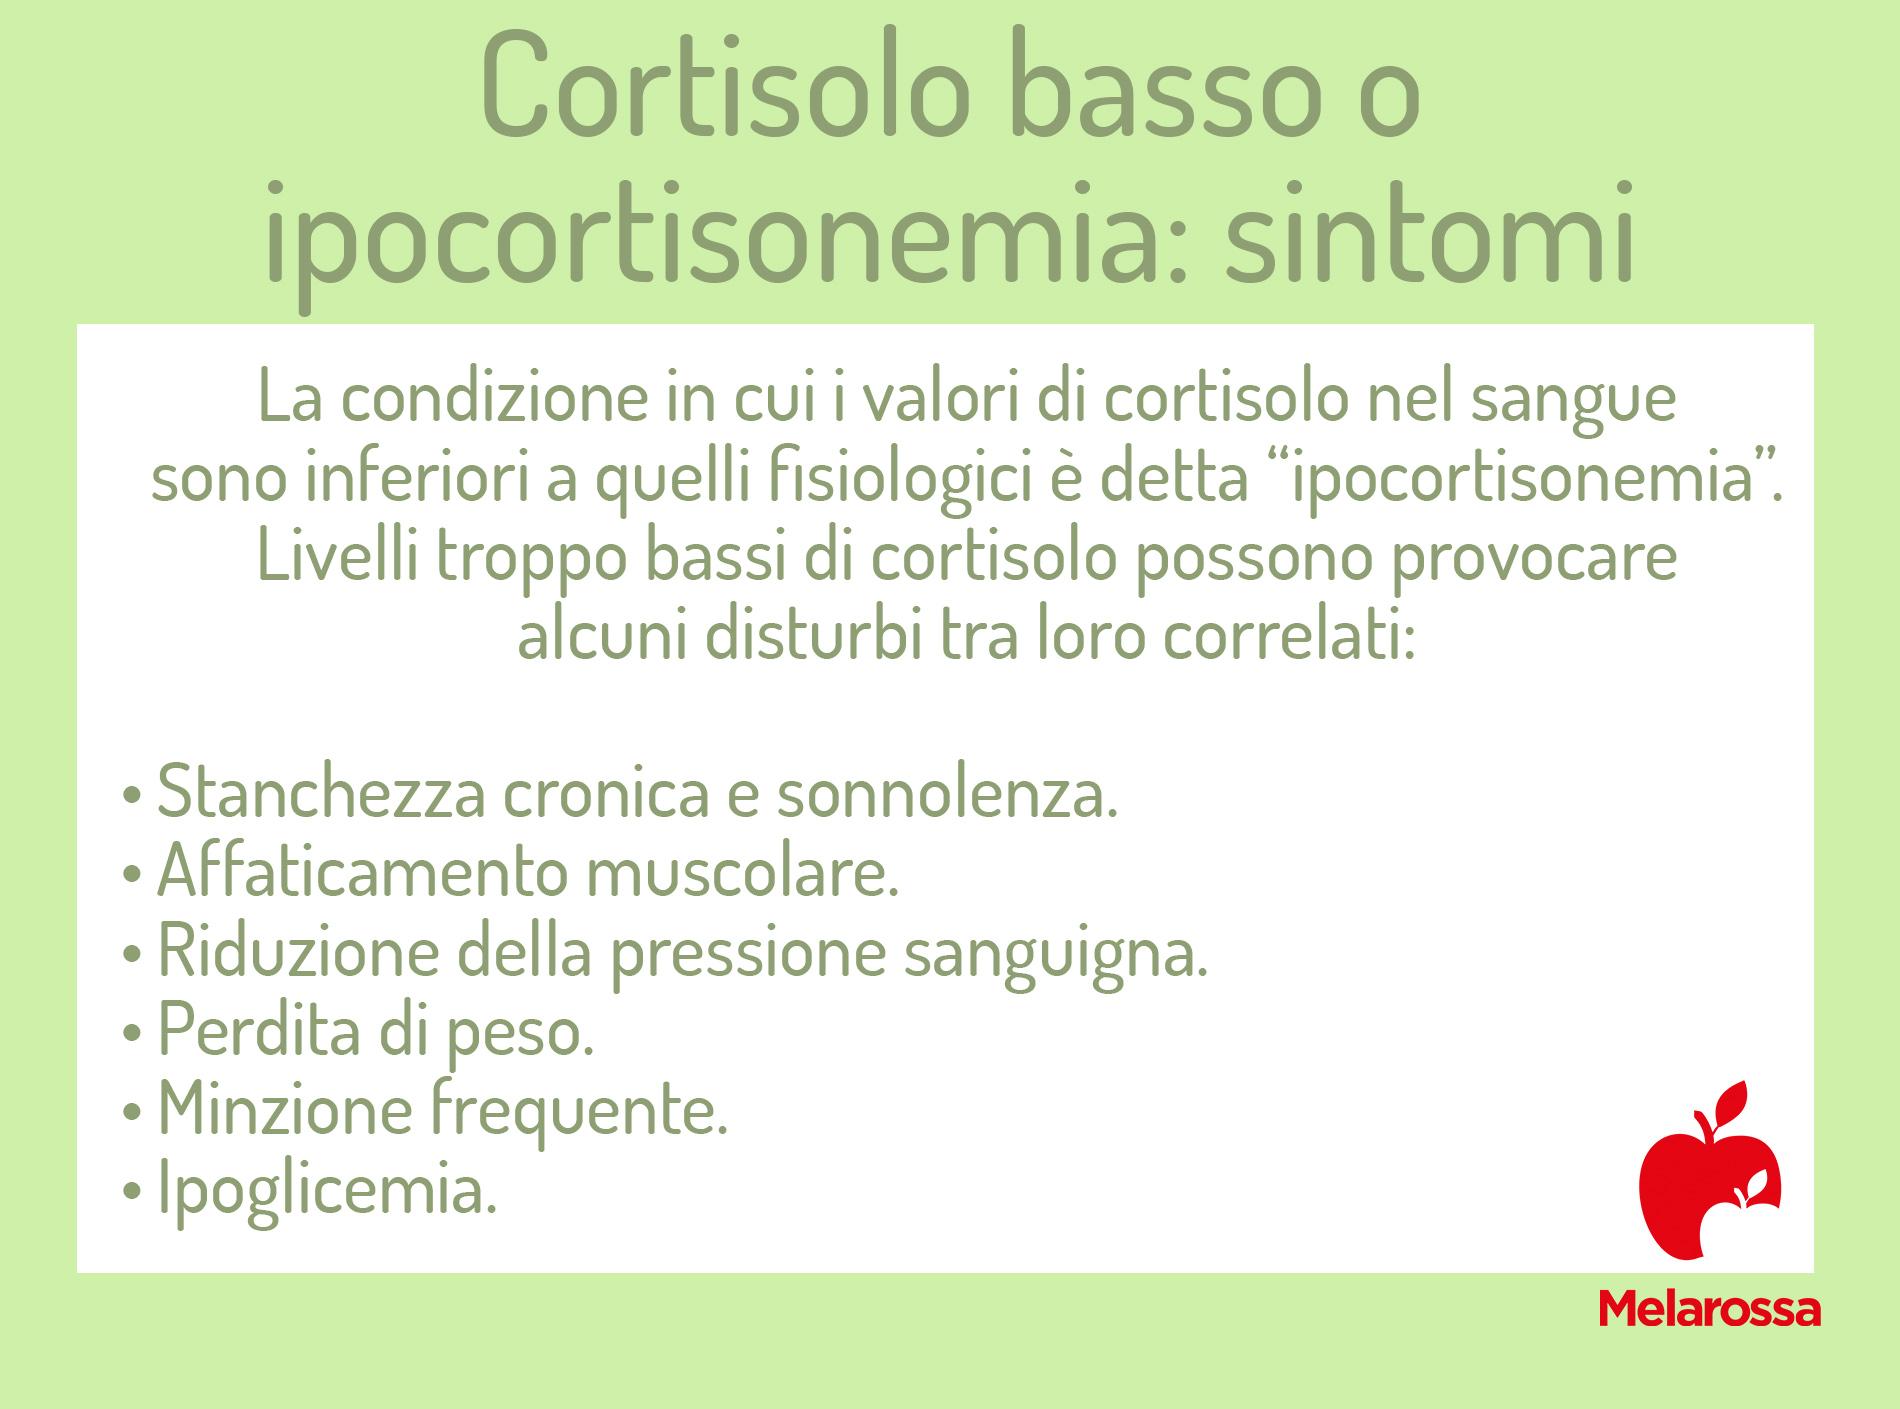 cortisolo basso: sintomi